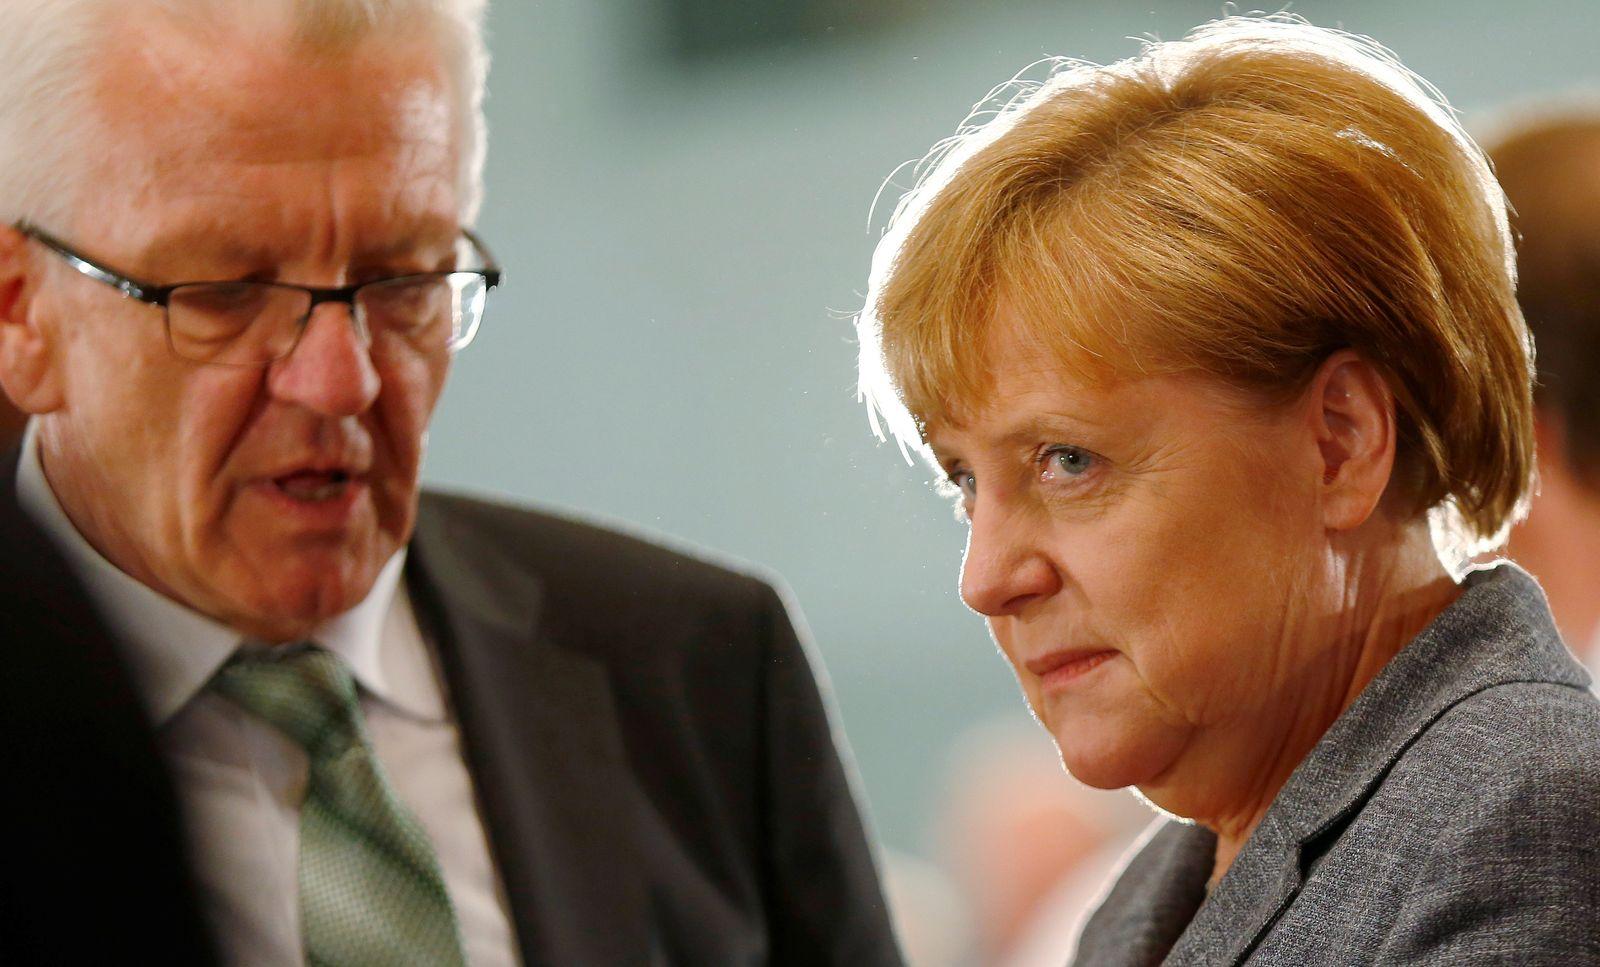 Winfried Kretschmann / Angela Merkel